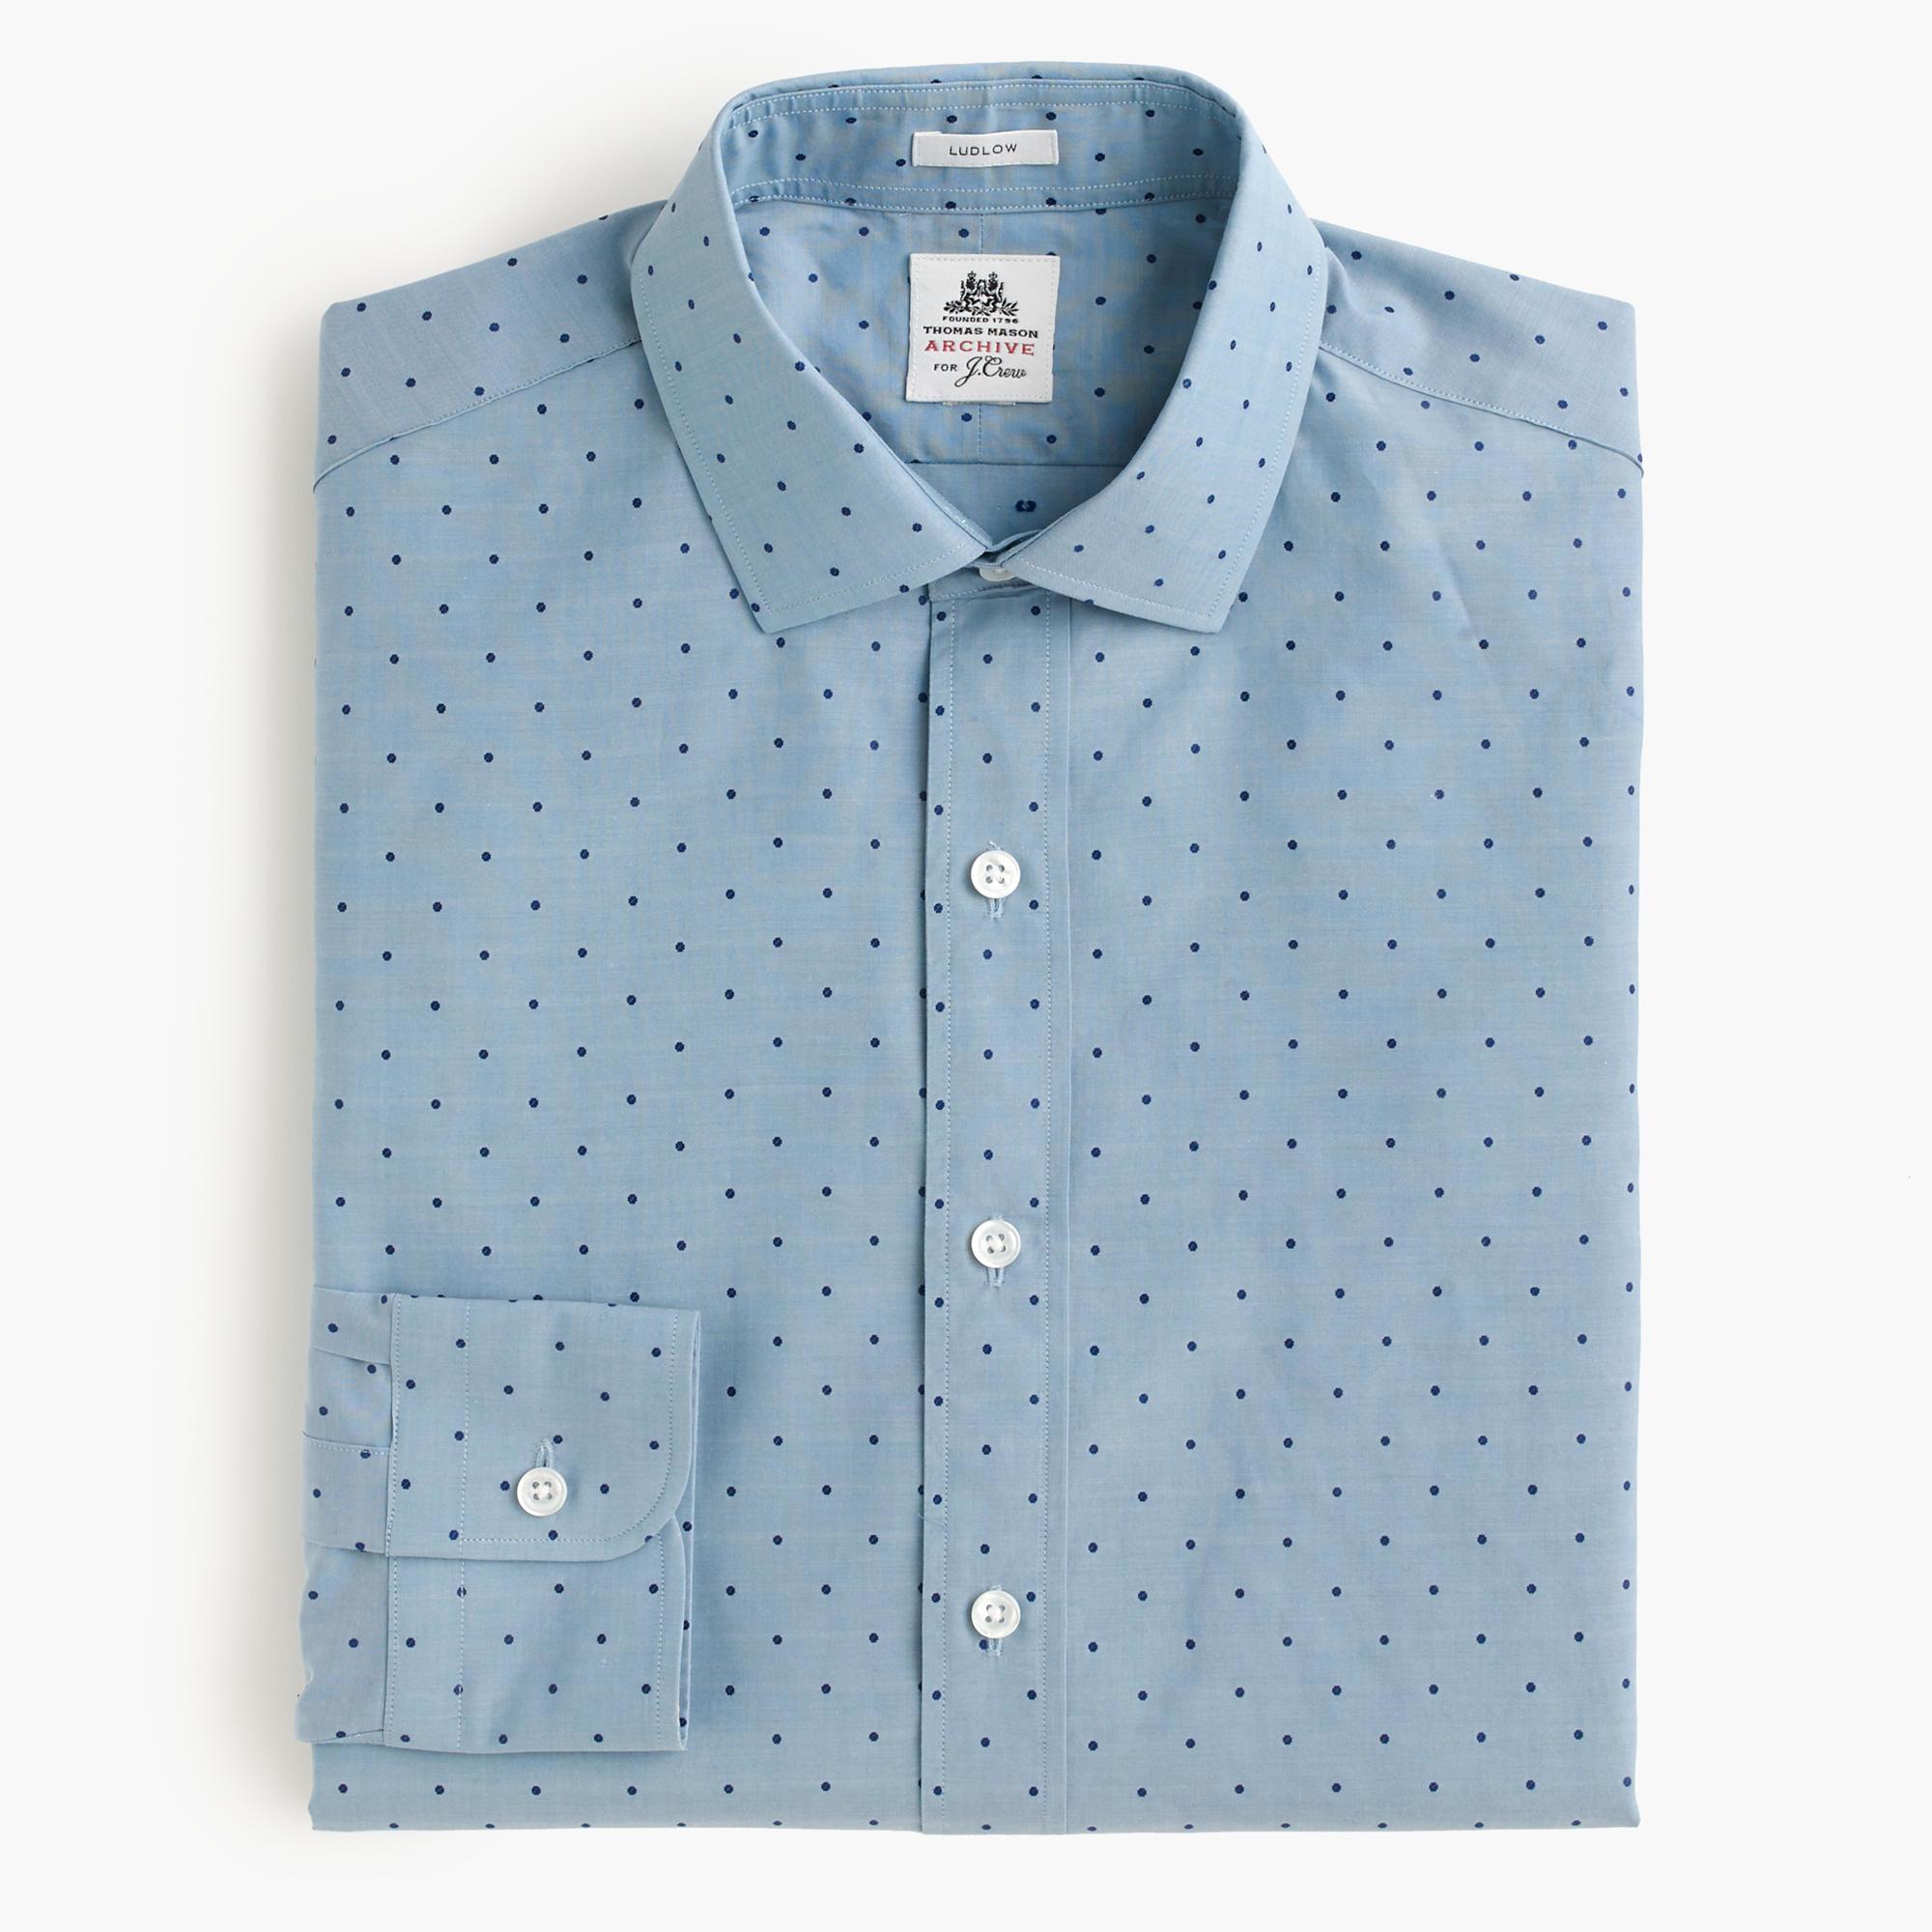 Lyst j crew thomas mason archive ludlow shirt in woven for Thomas mason dress shirts